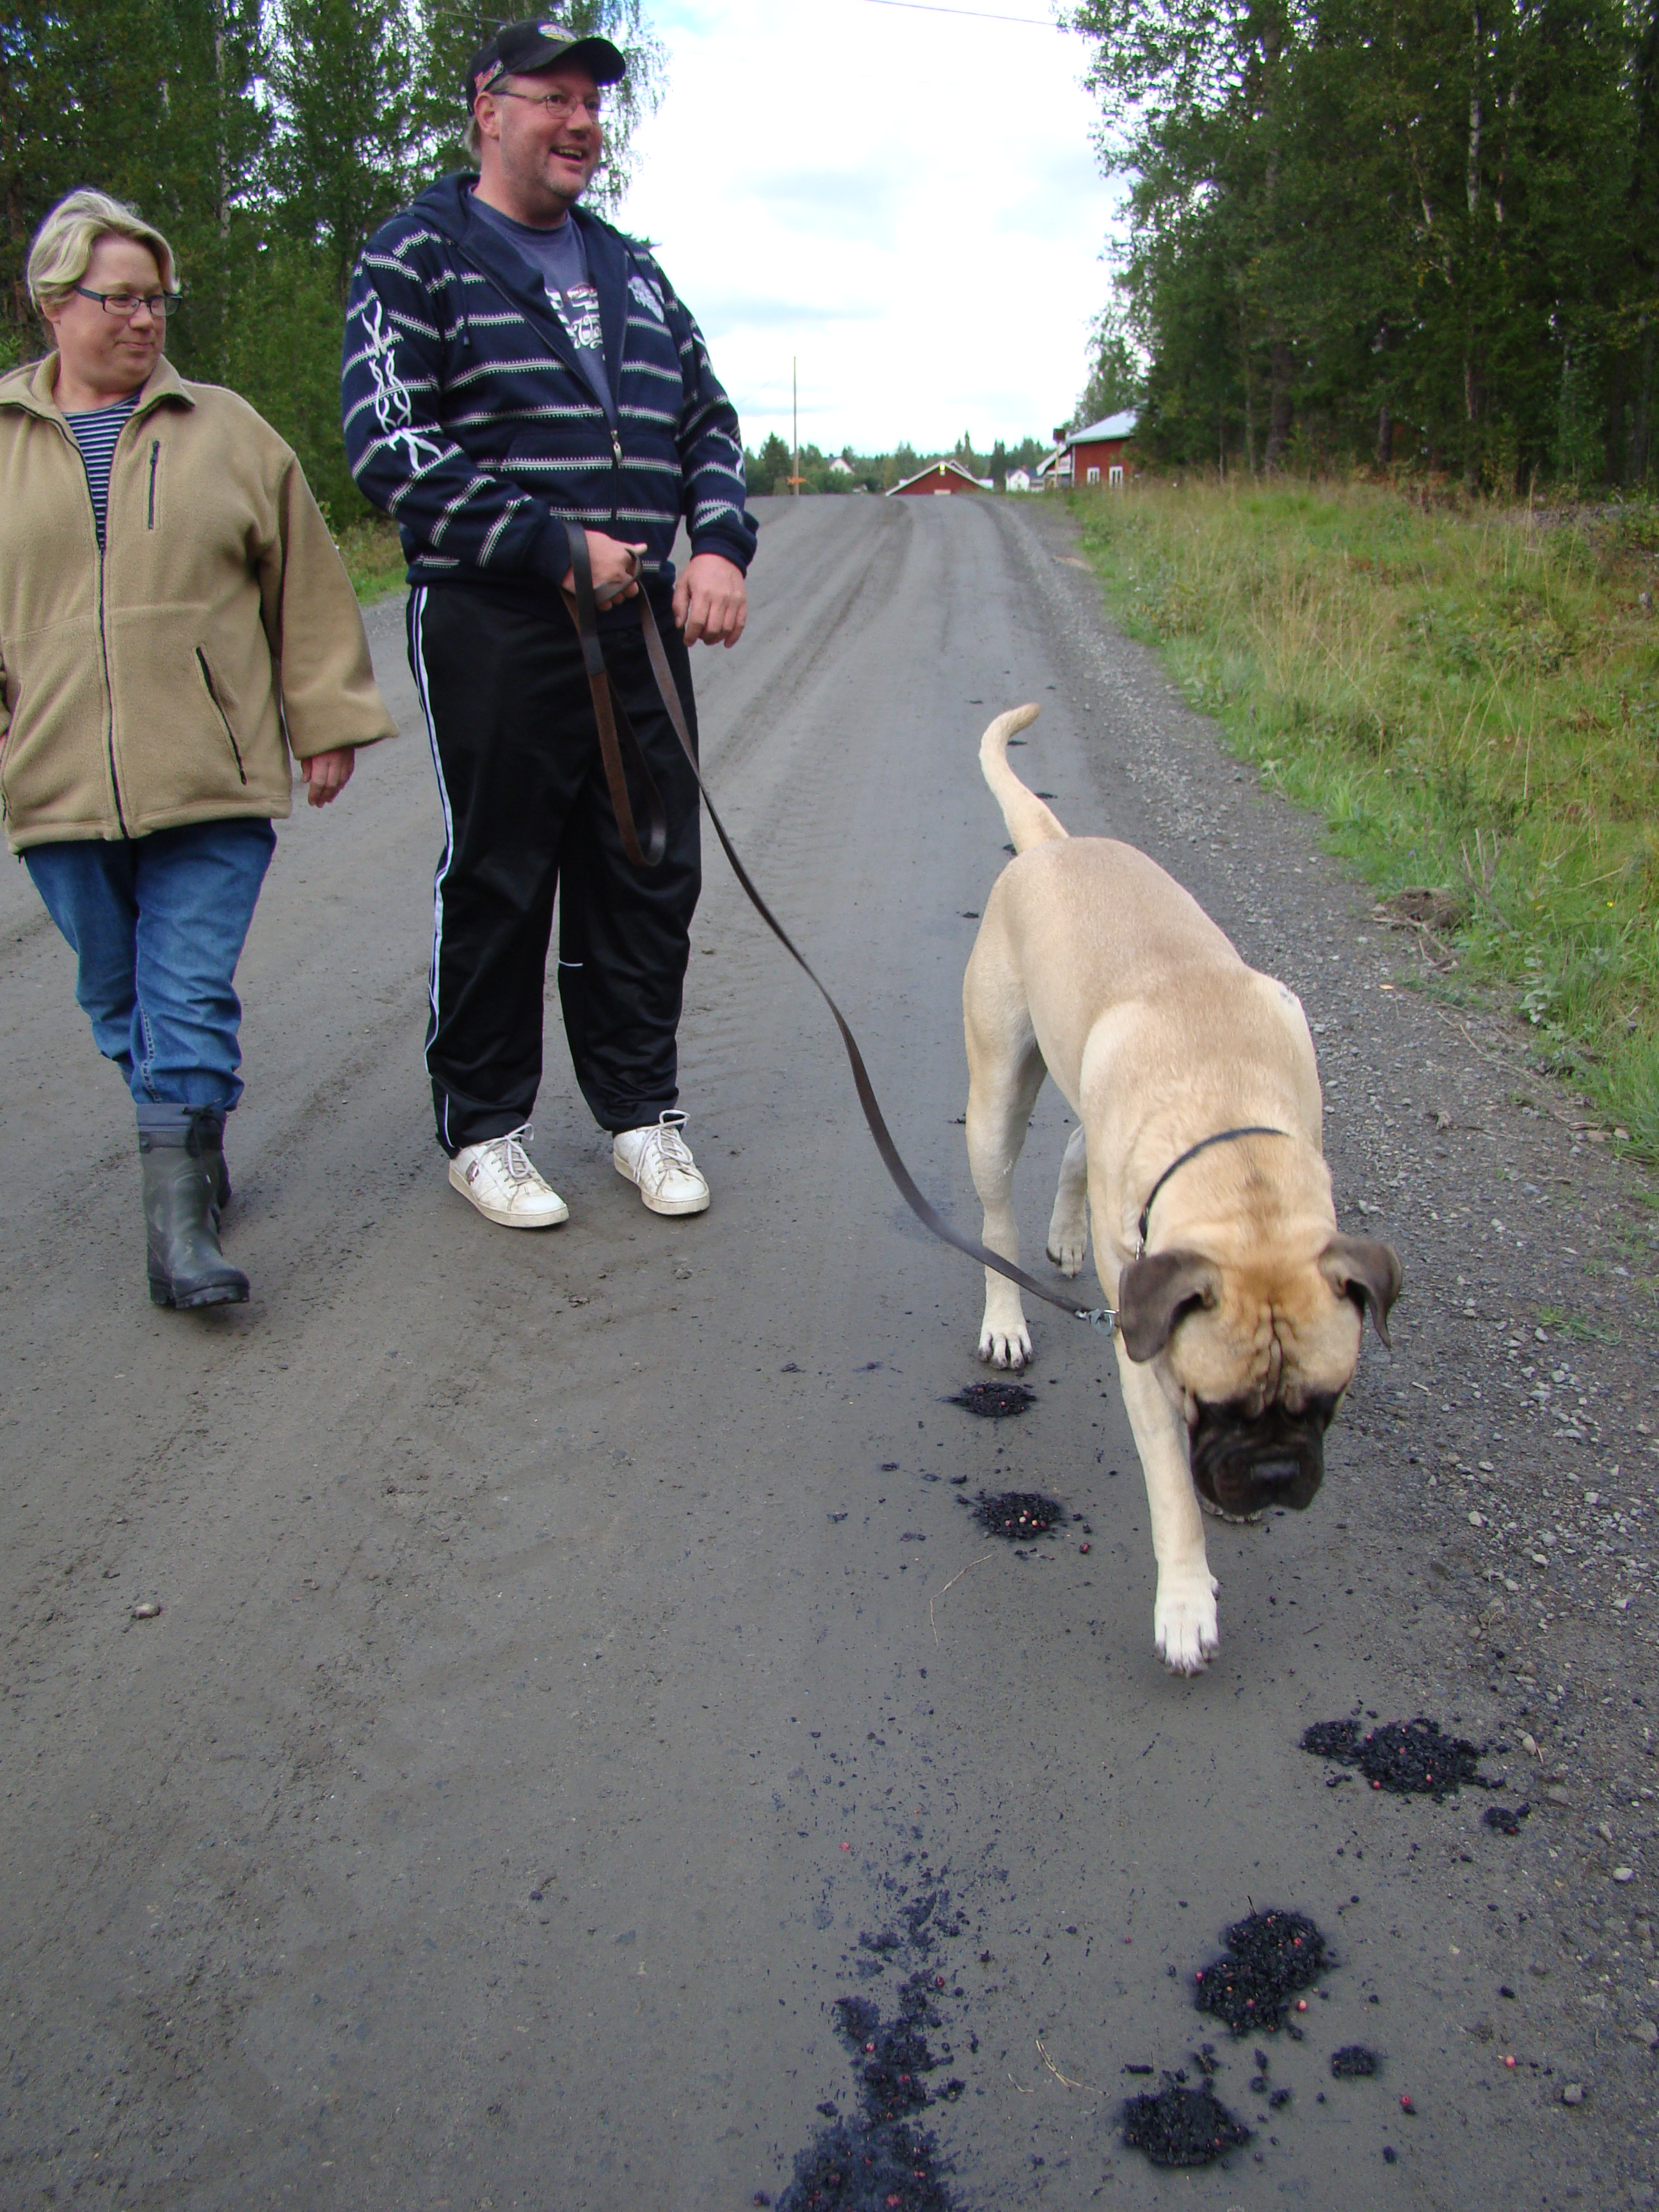 Arkivbild: Björnspillning inne i byn.